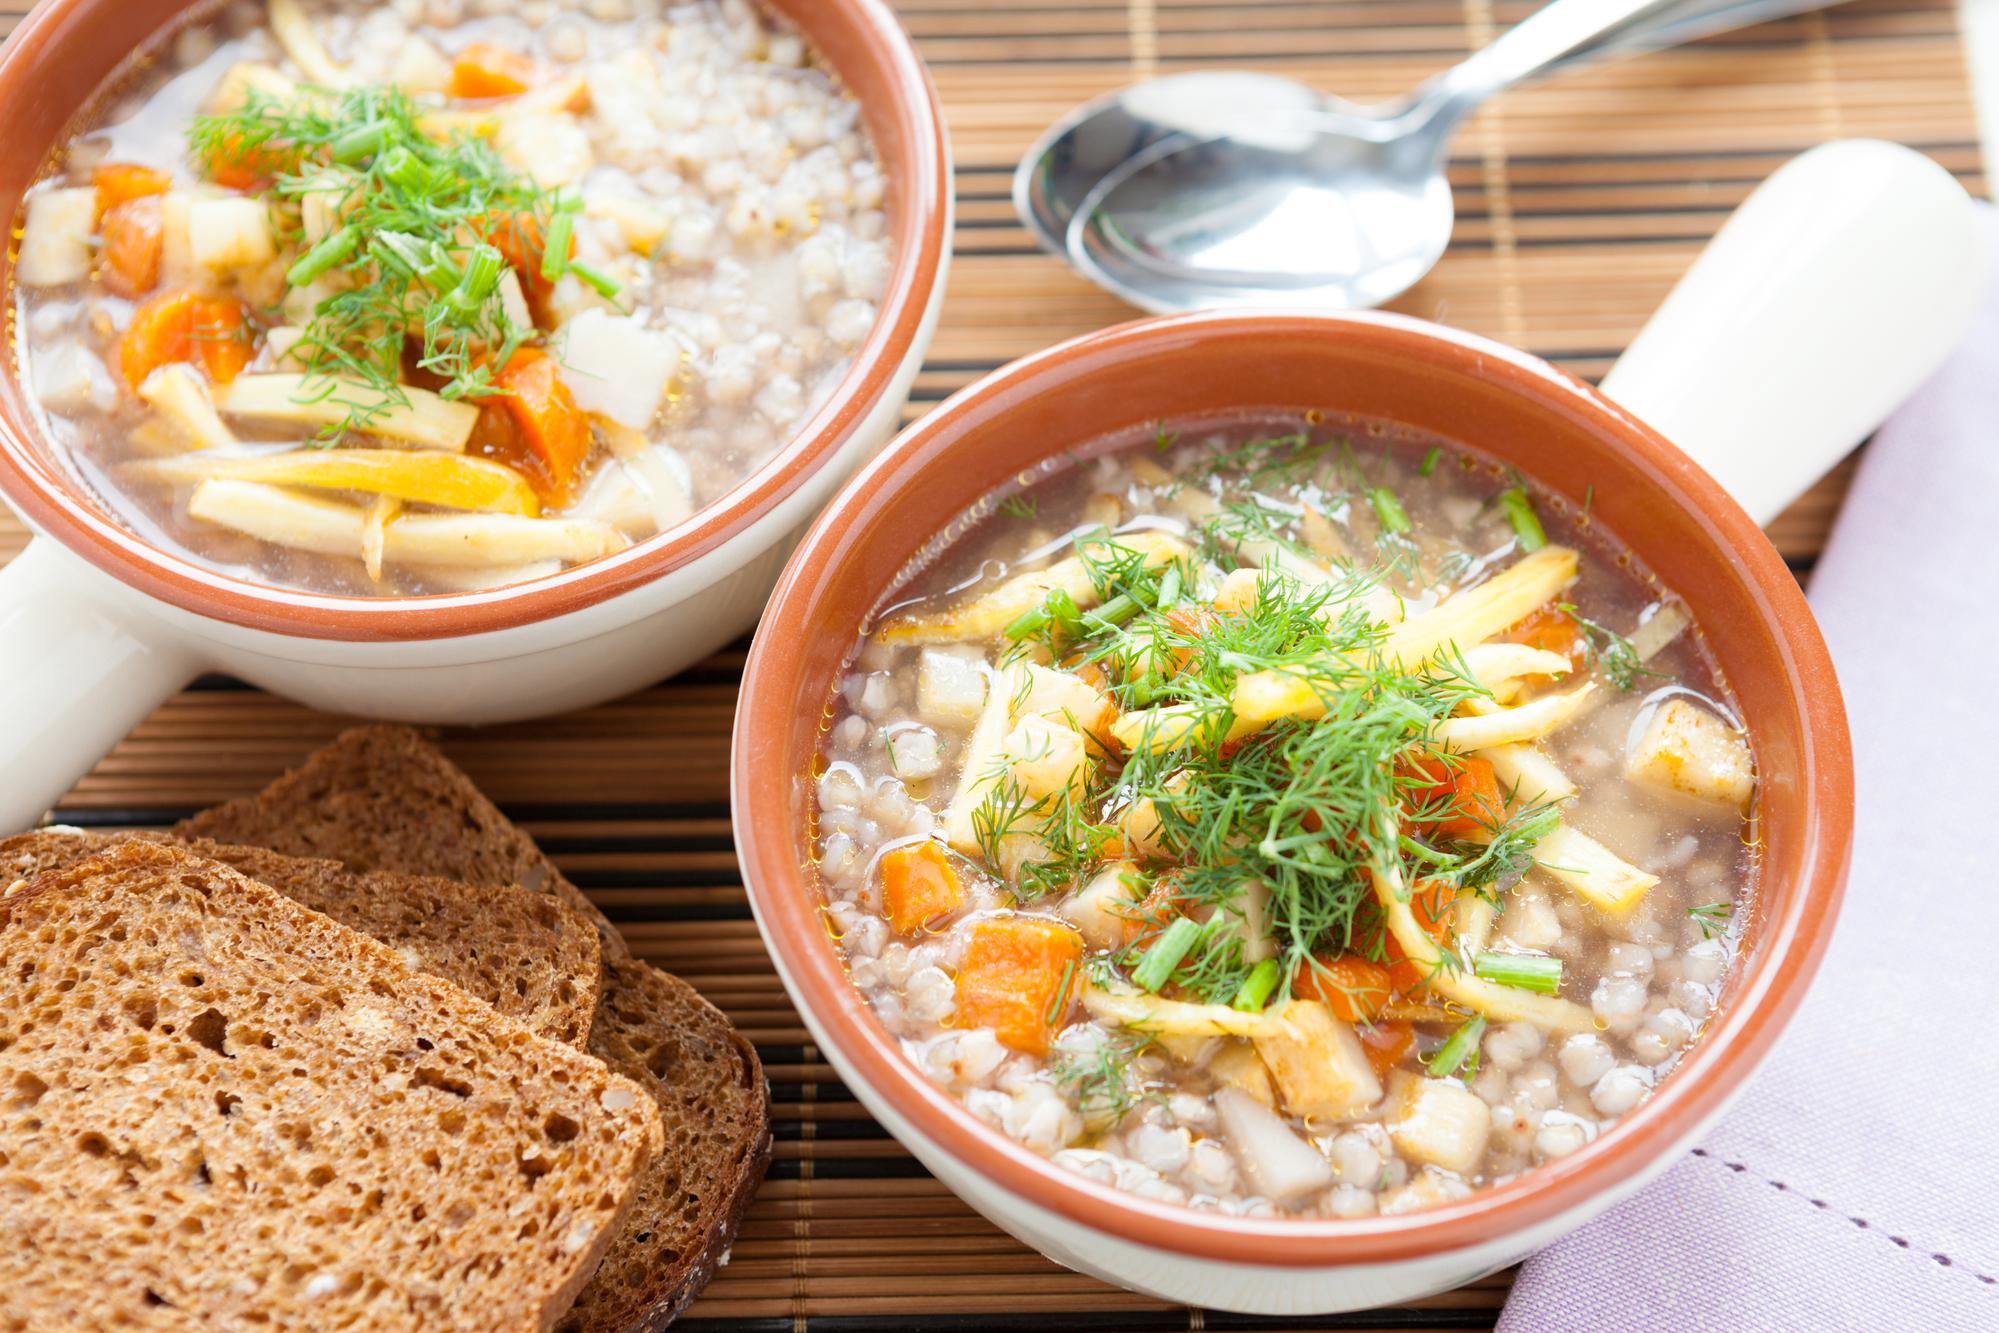 Schonkost-Topf mit Pastinake und Karotte - Rezept | kochenOHNE